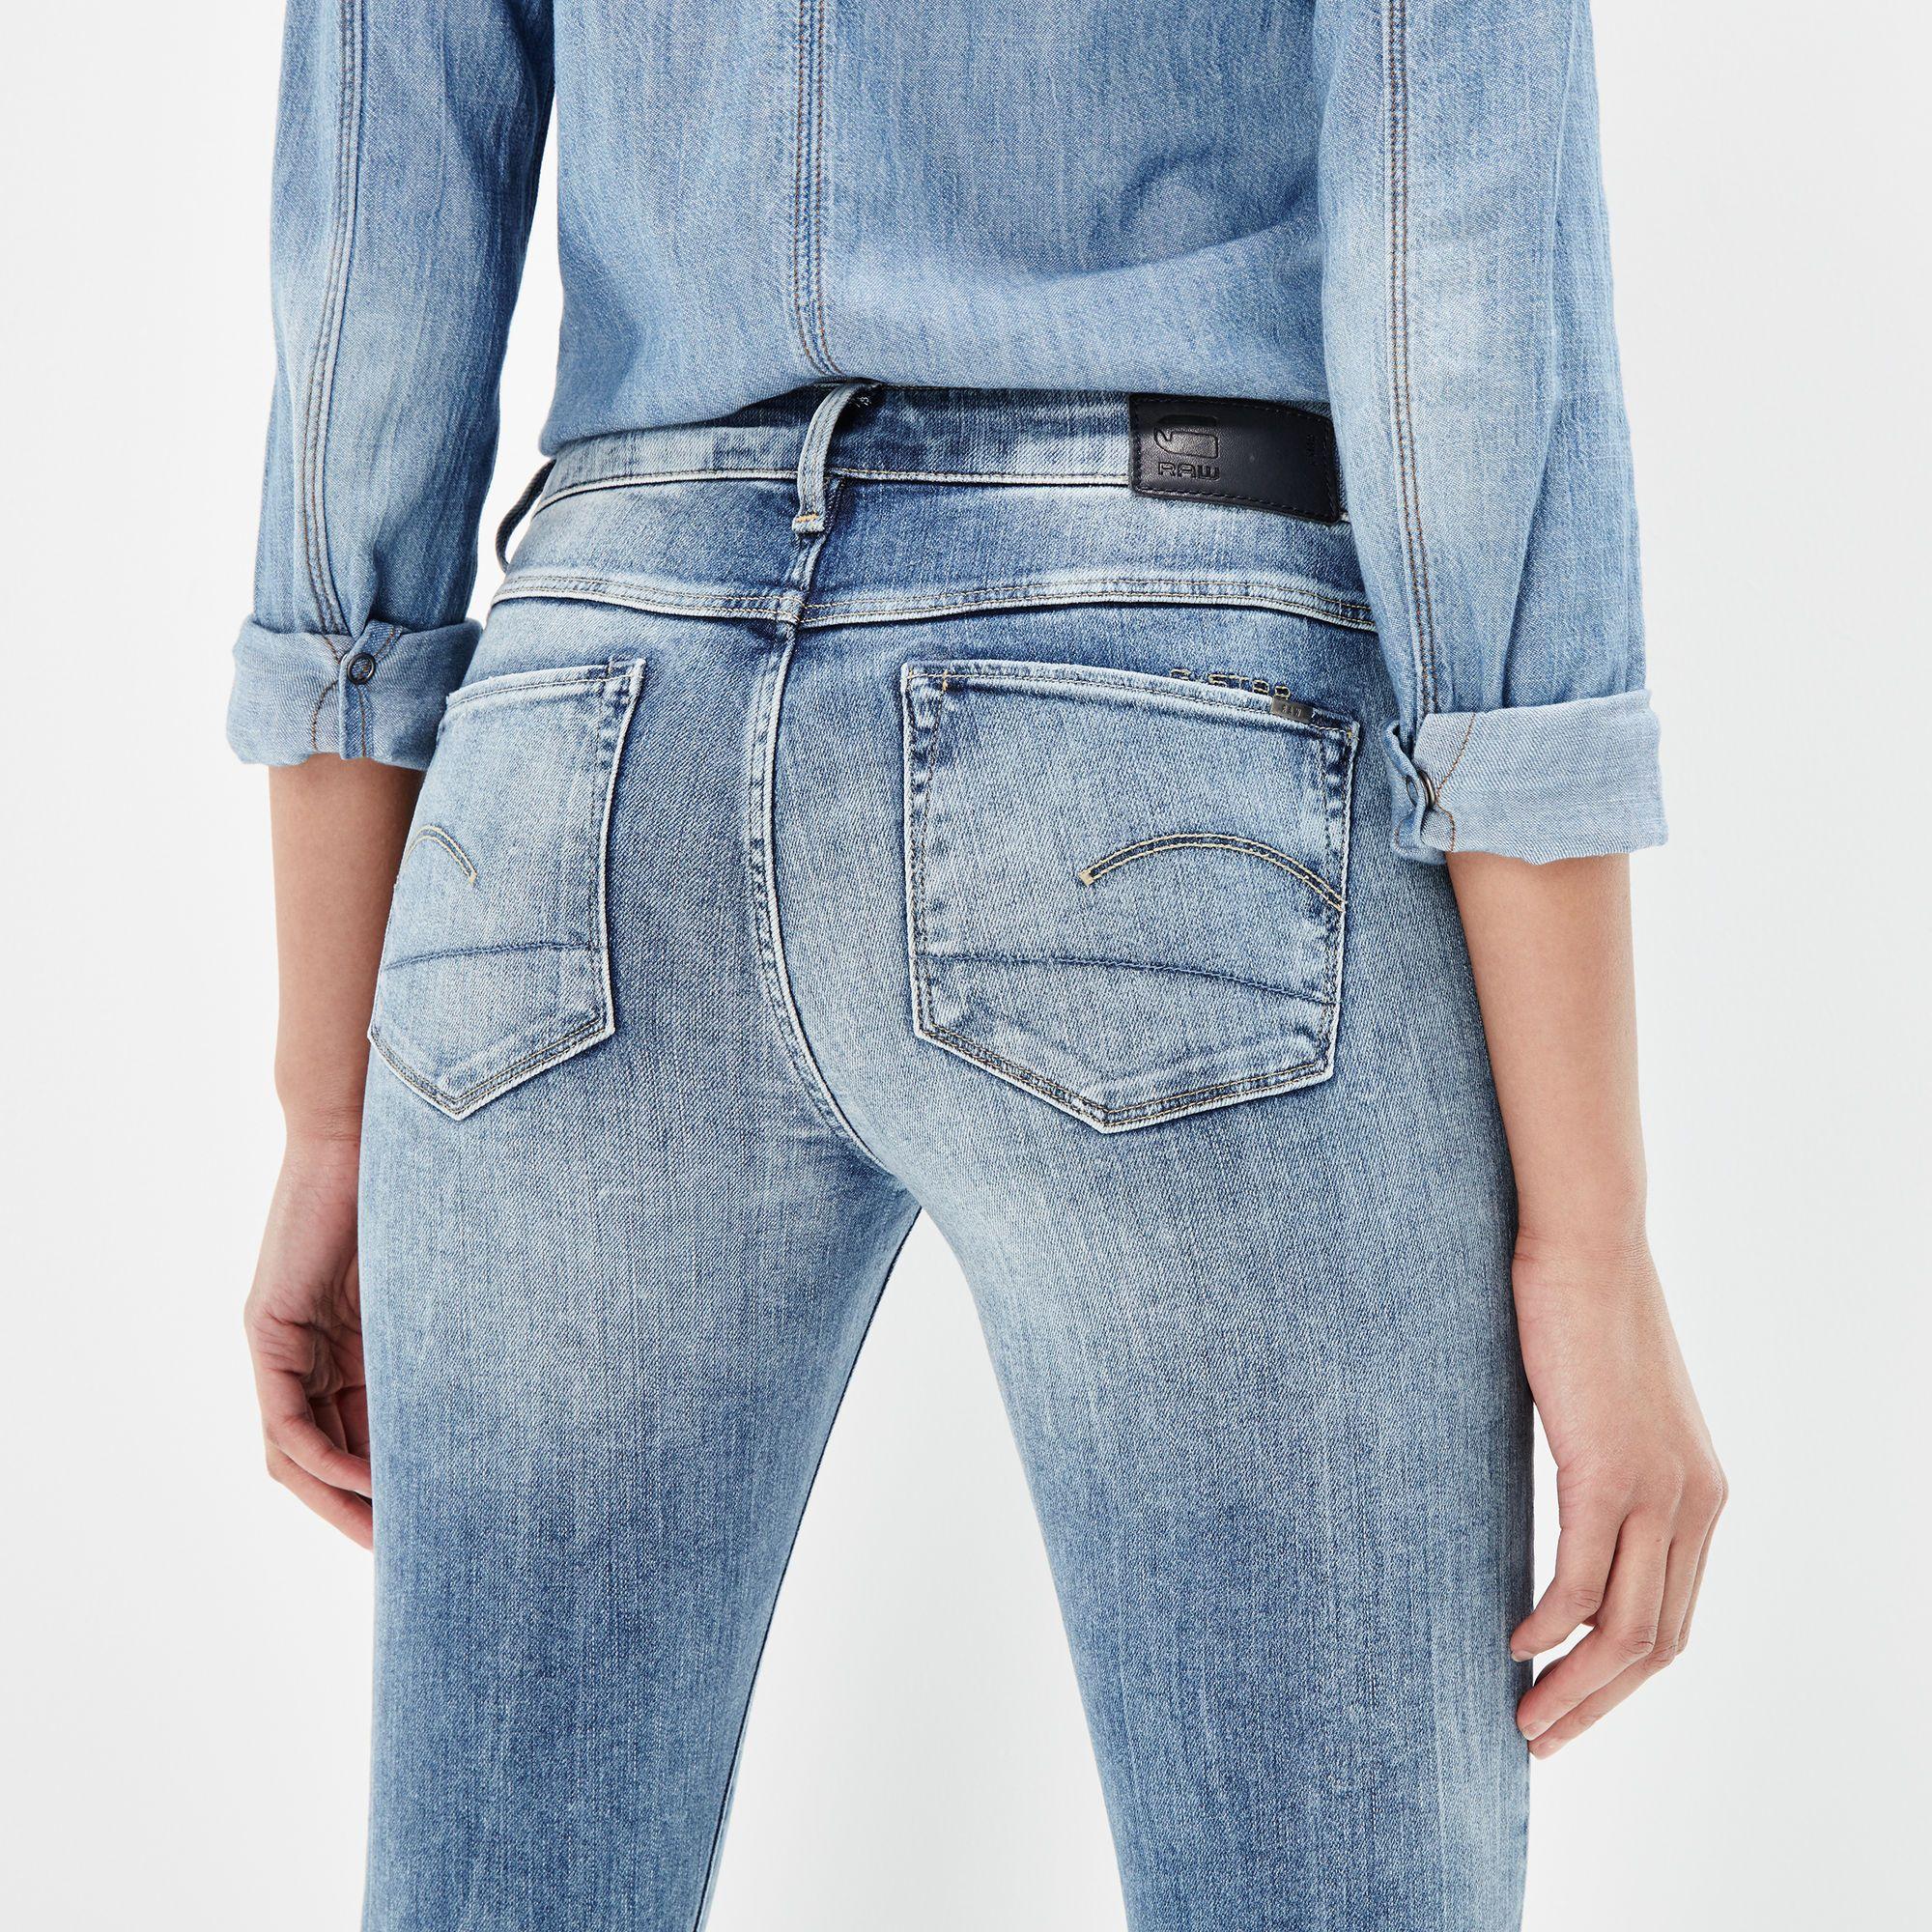 G-Star RAW 3301 Contour High Waist Skinny Jeans